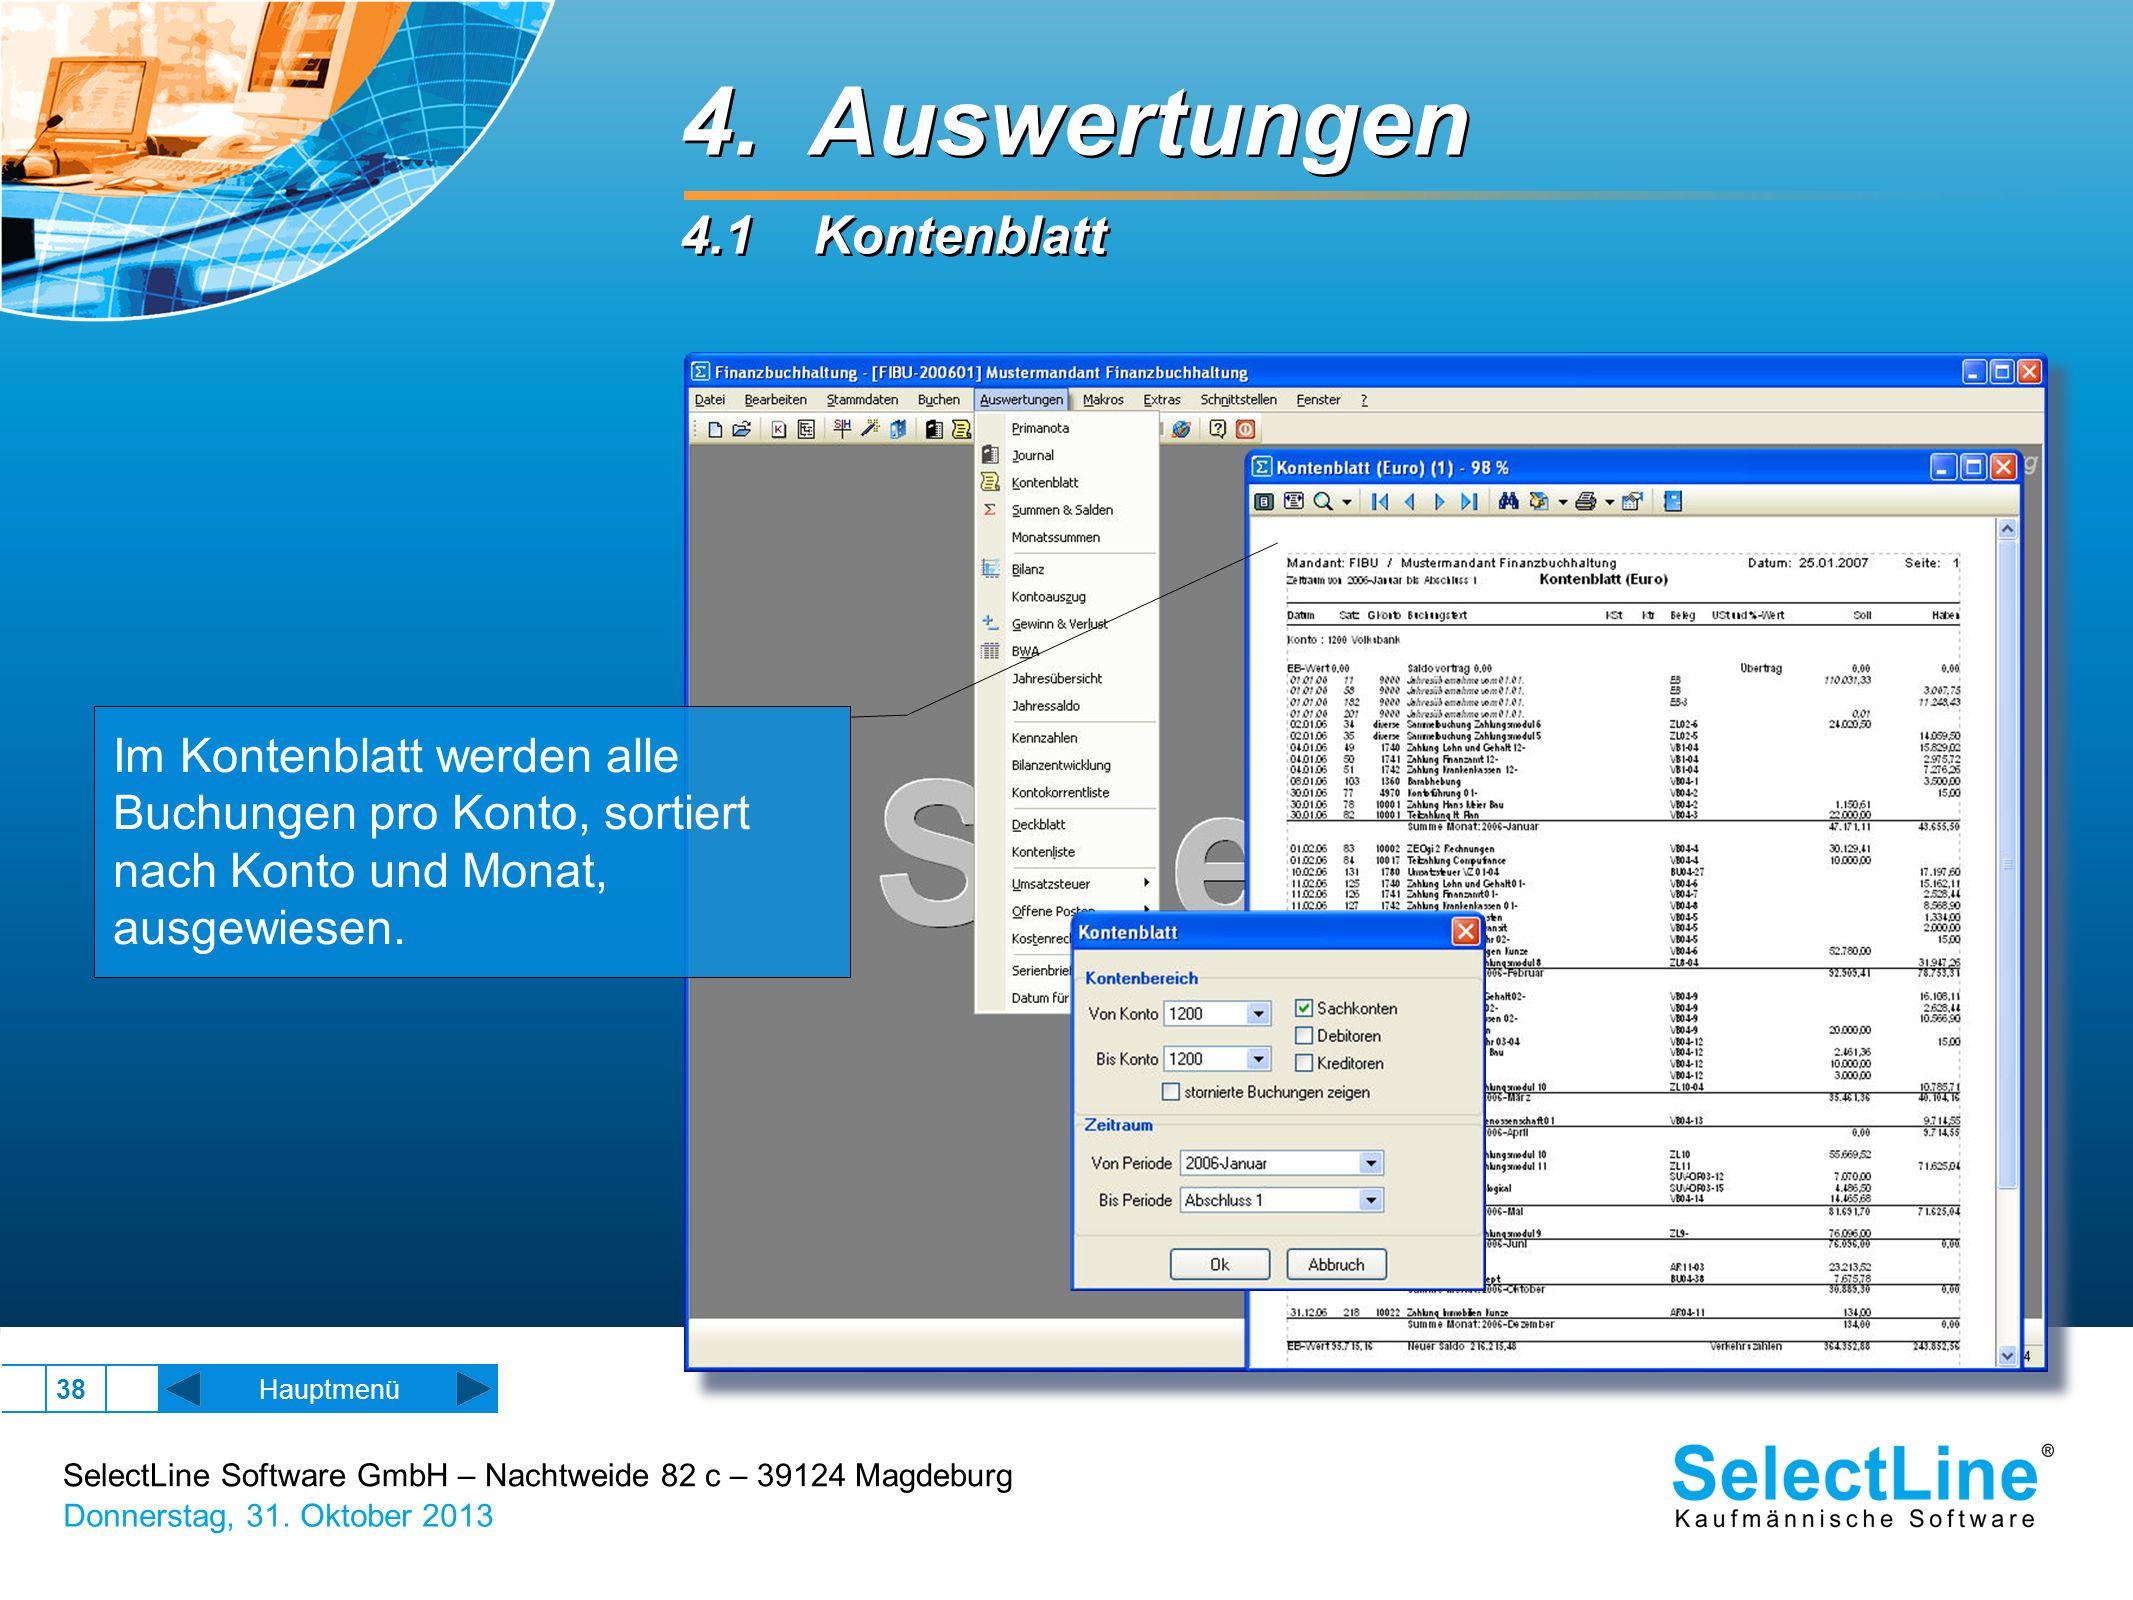 SelectLine Software GmbH – Nachtweide 82 c – 39124 Magdeburg Donnerstag, 31. Oktober 2013 38 Hauptmenü 4. Auswertungen 4.1 Kontenblatt 4. Auswertungen